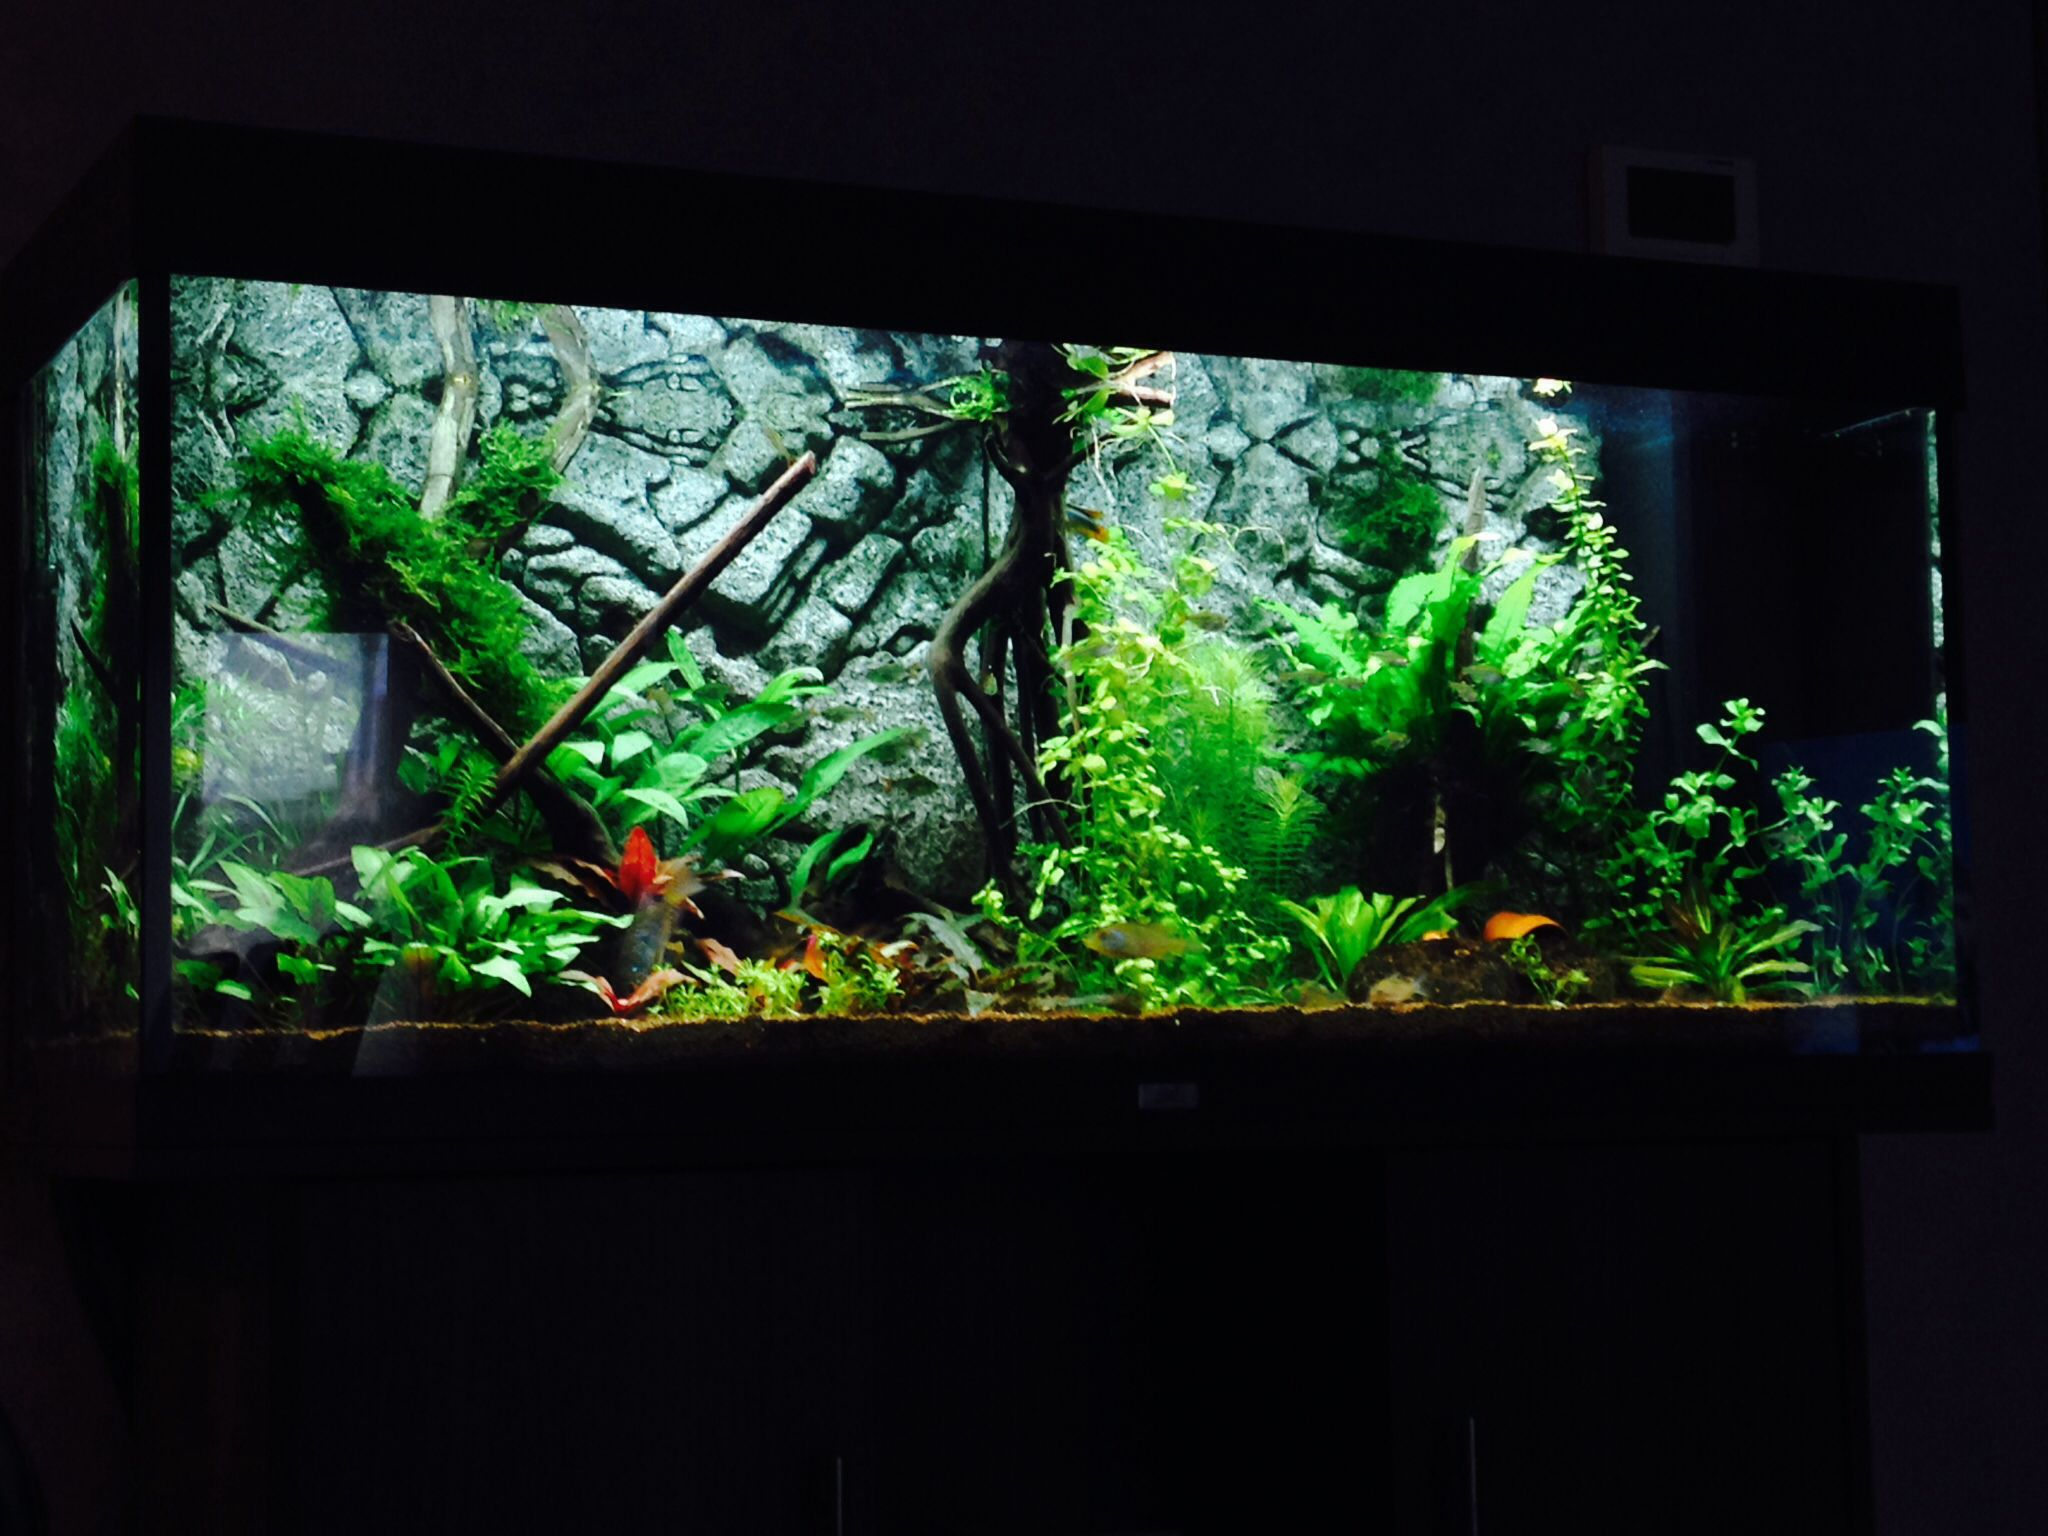 Juwel aqua clean aquarium fish tank gravel - Planted Freshwater Aquarium Juwel Rio